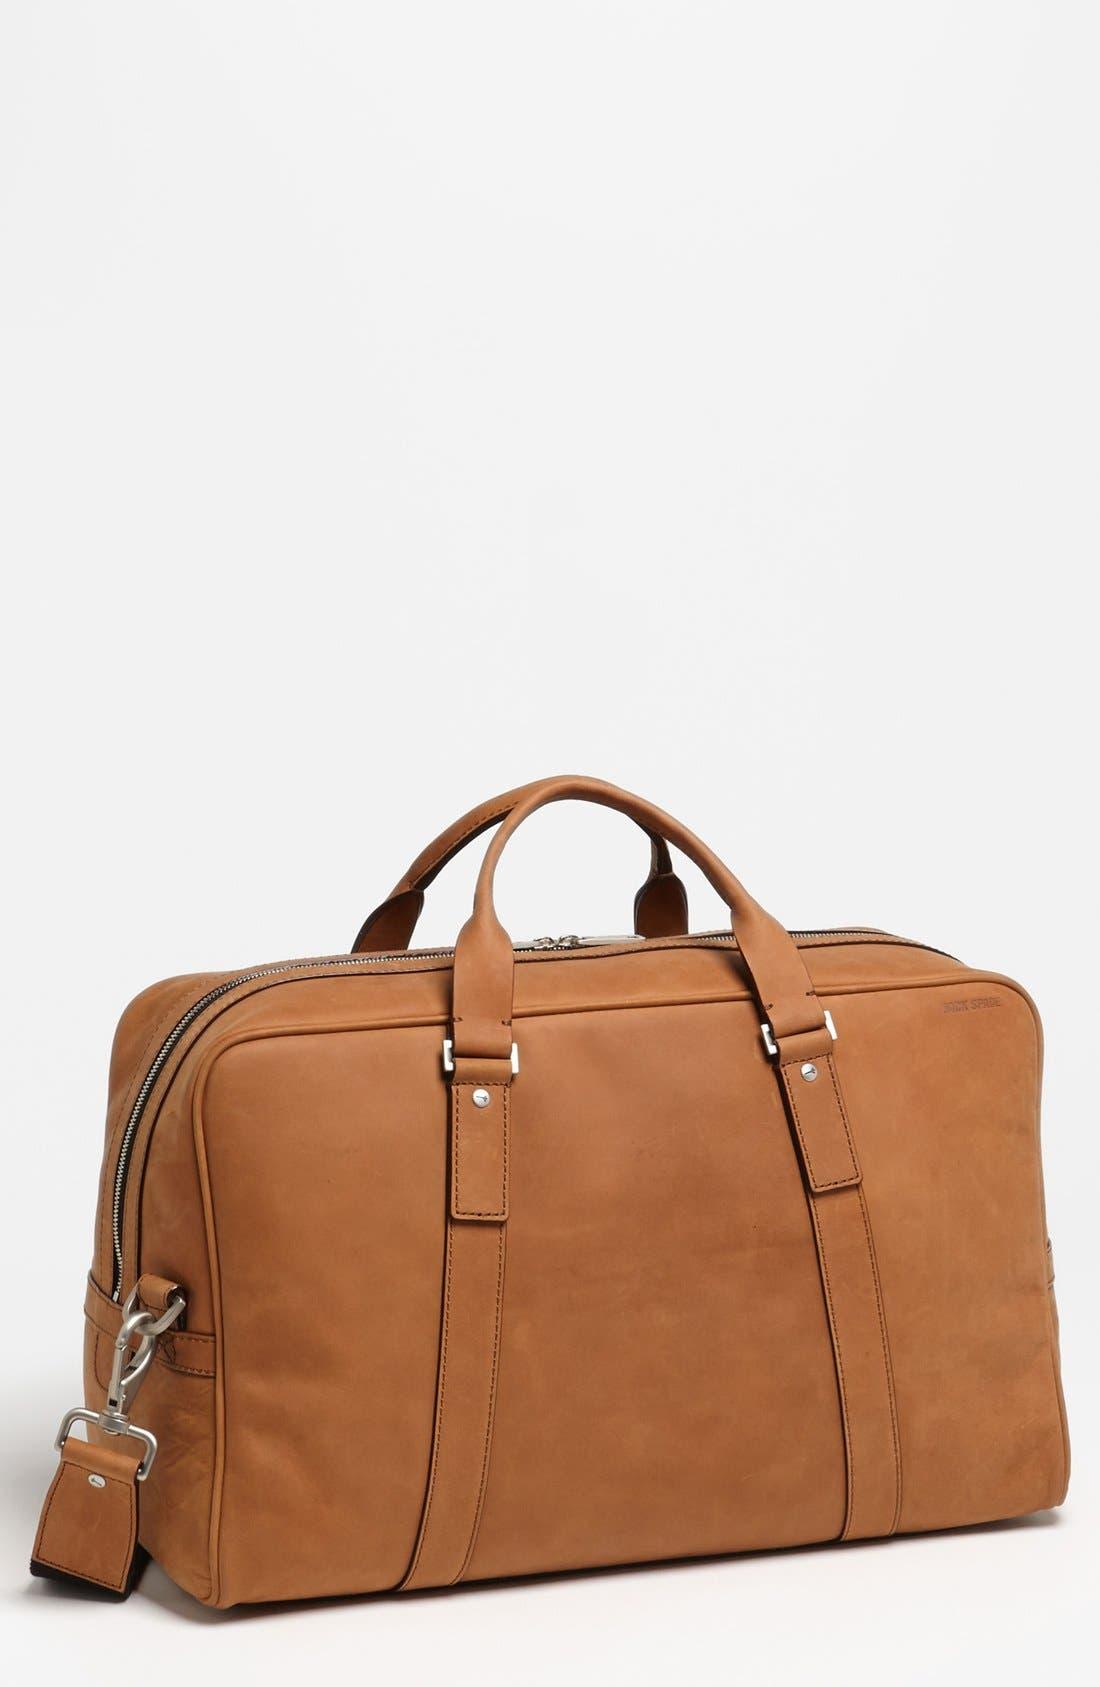 Alternate Image 1 Selected - Jack Spade 'Small - Eaton' Duffel Bag